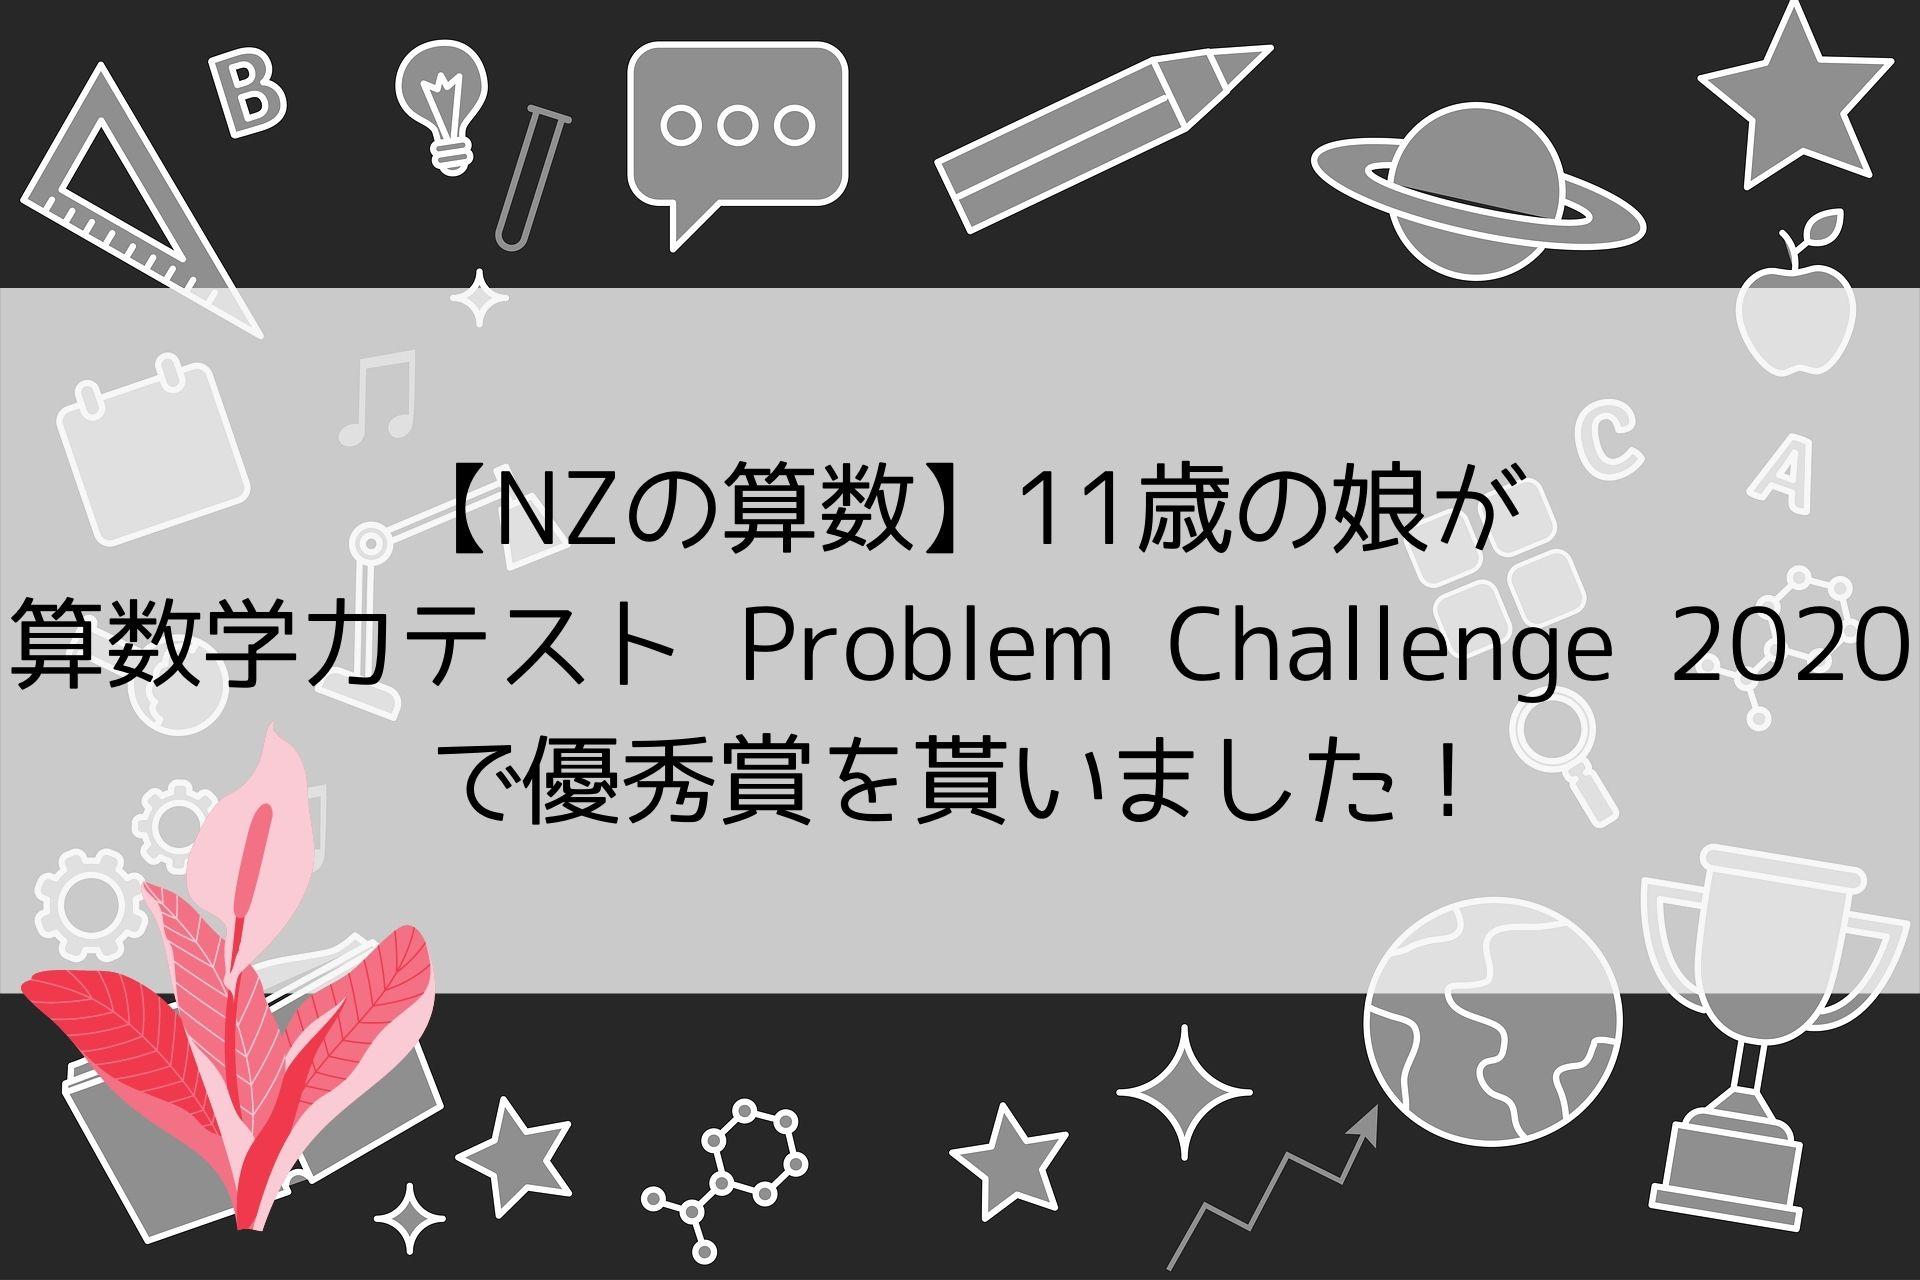 【NZの算数】11歳の娘が 算数の大会Problem Challenge 2020で優秀賞を貰いました!